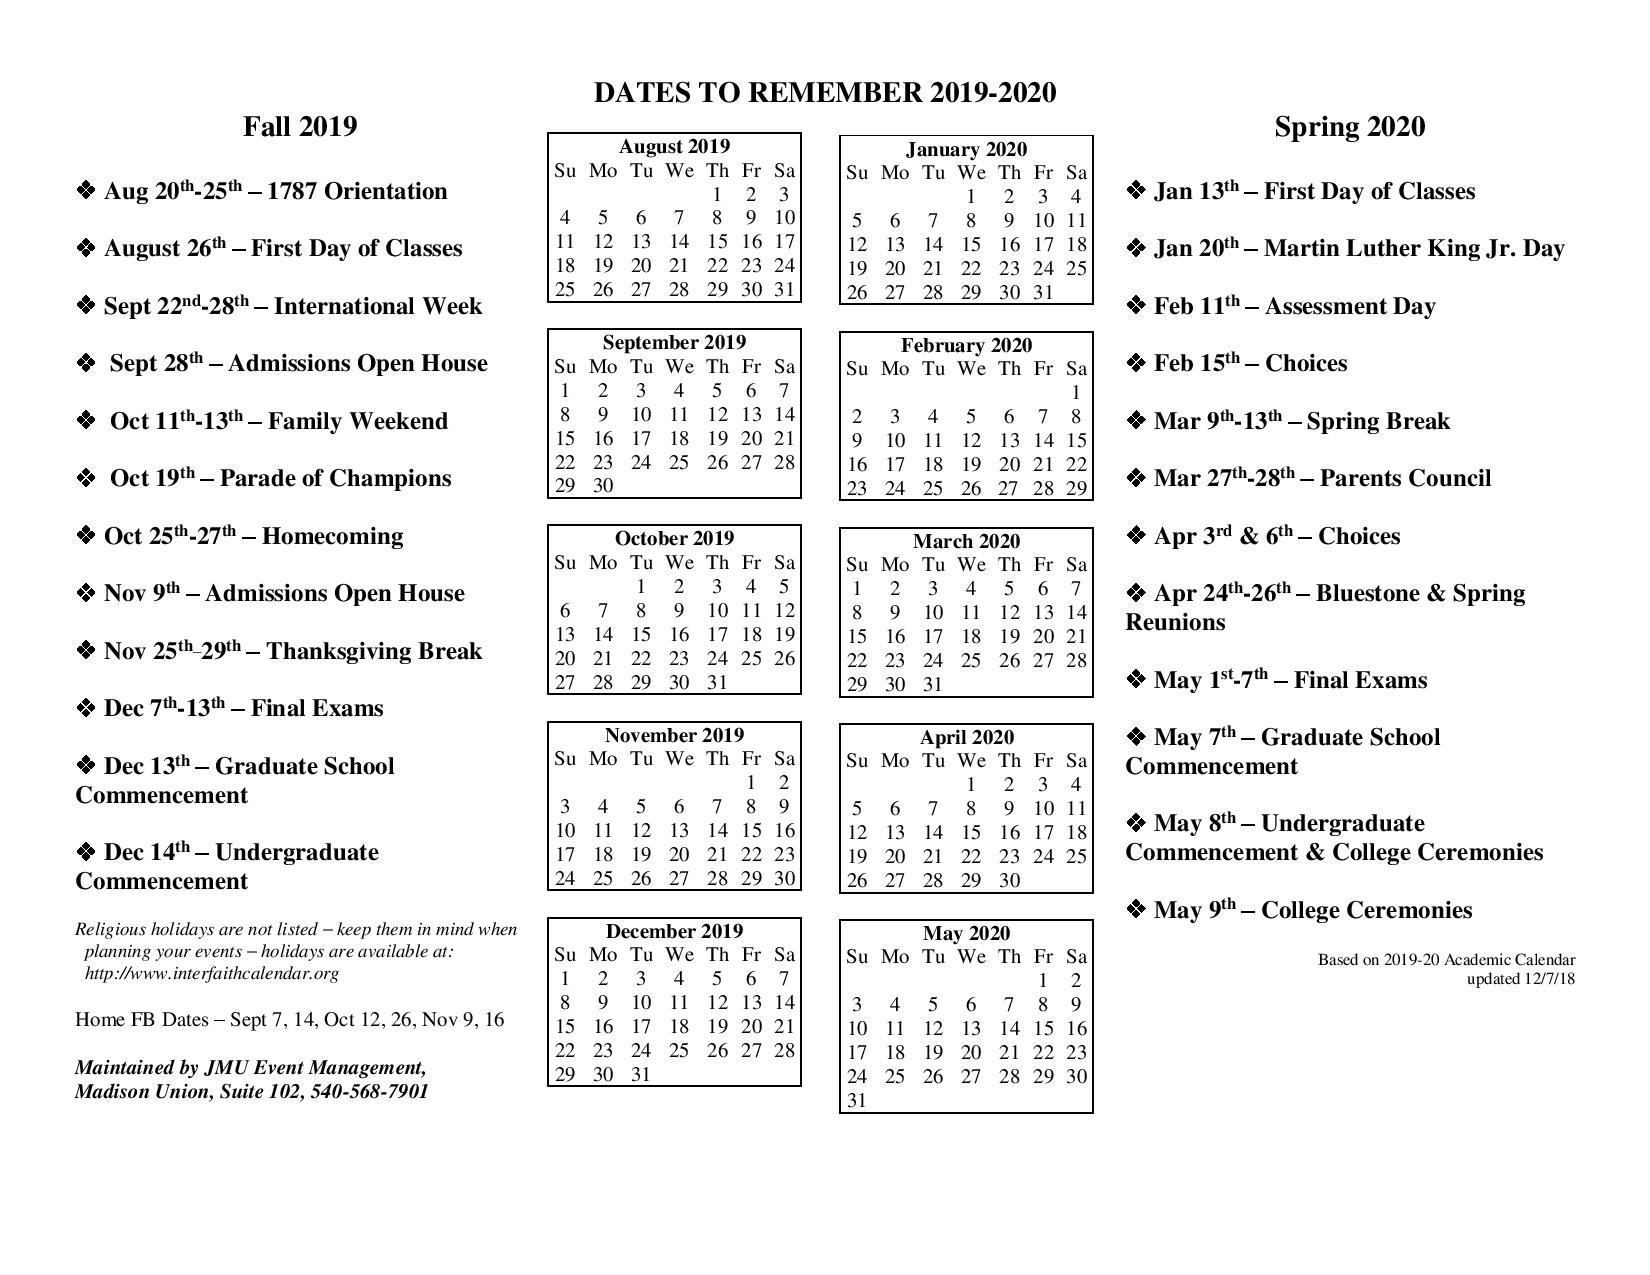 ✅Jmu Academic Calendar 2019-2020 Important Dates - You